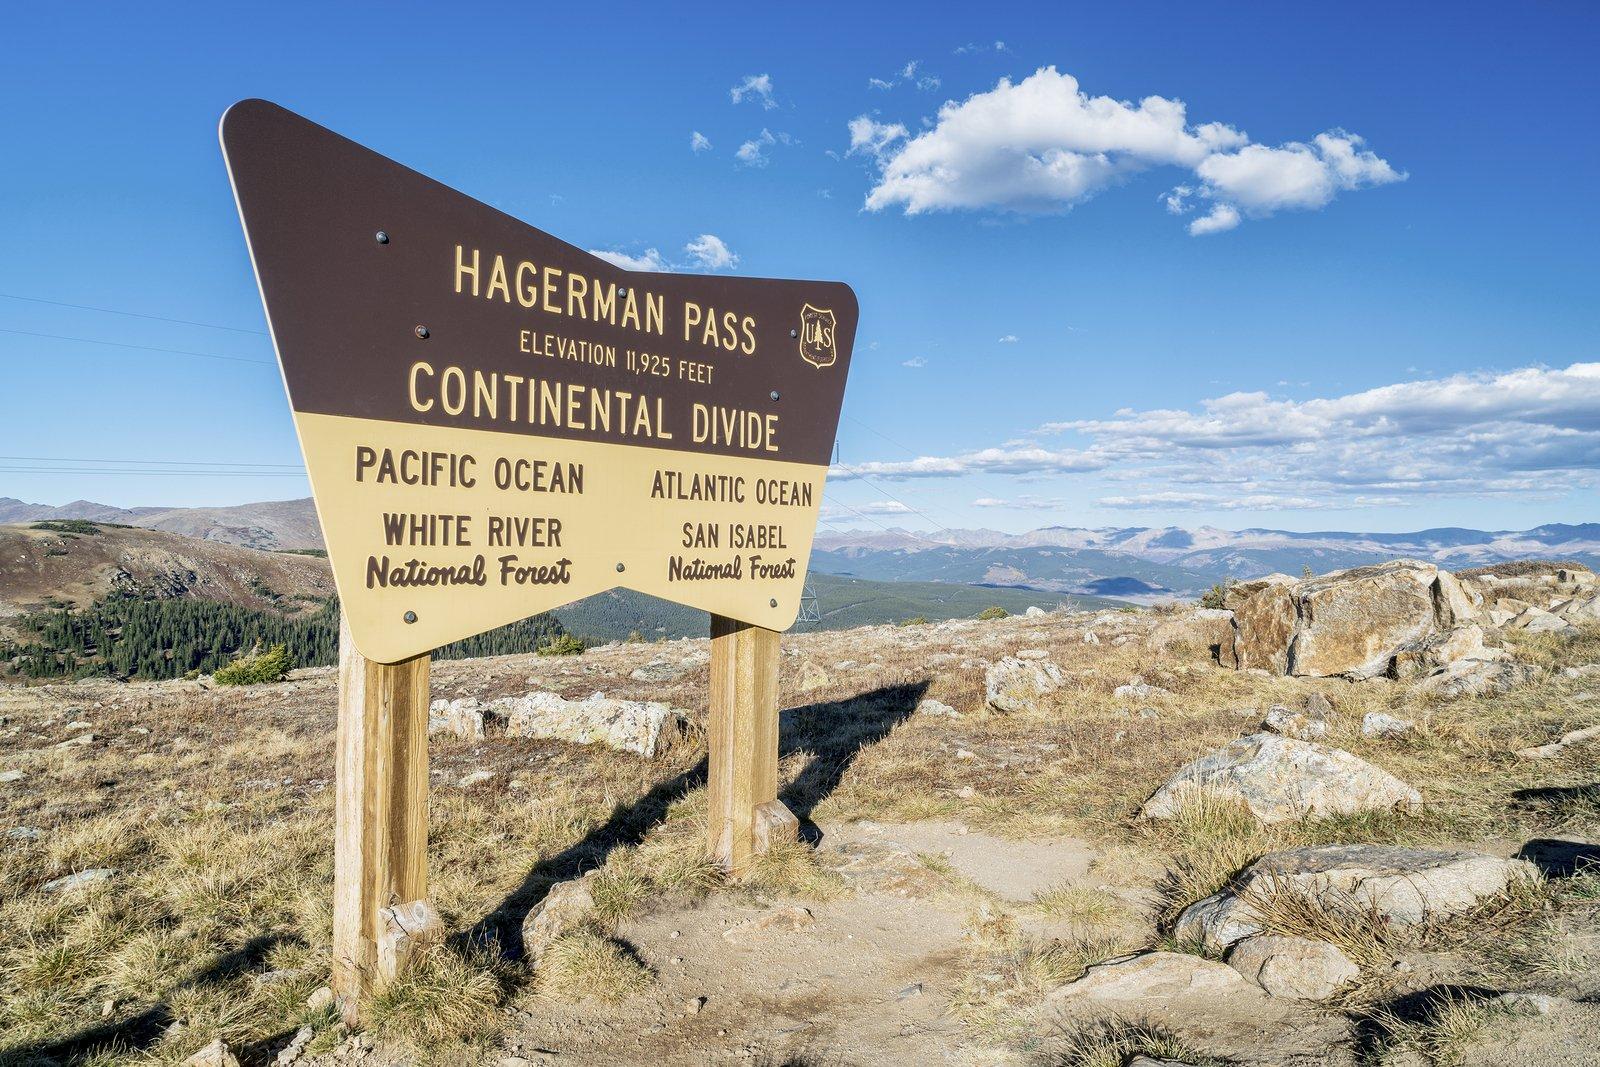 Hagerman Pass thumbnail